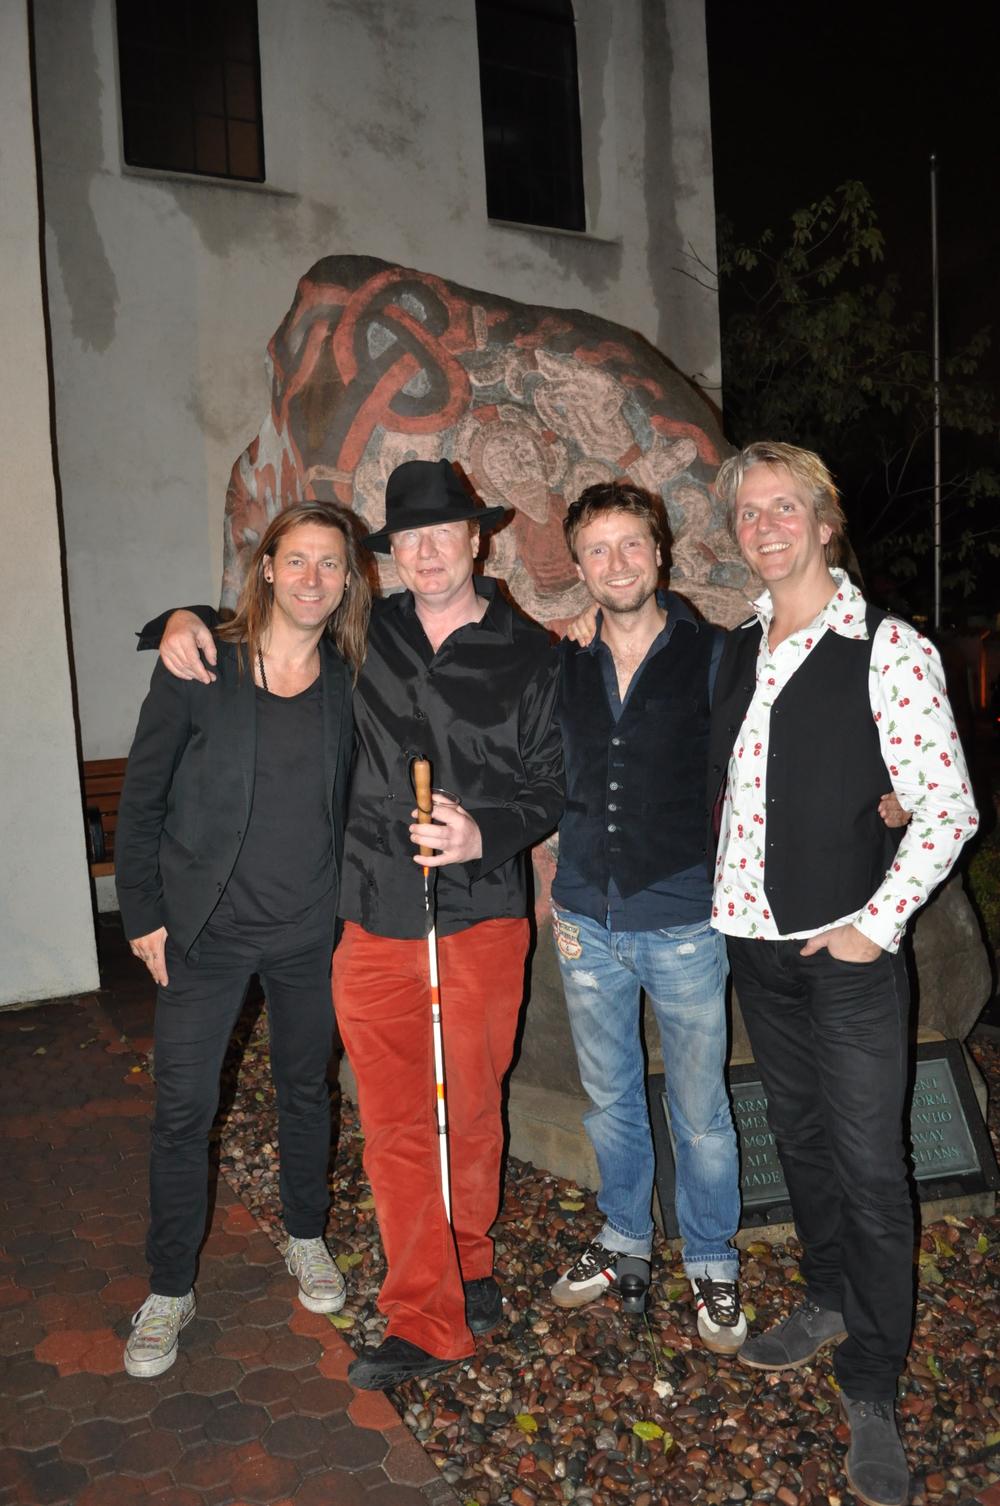 Henrik Engquist, Søren Hawk, Poul,  David Rosenkilde